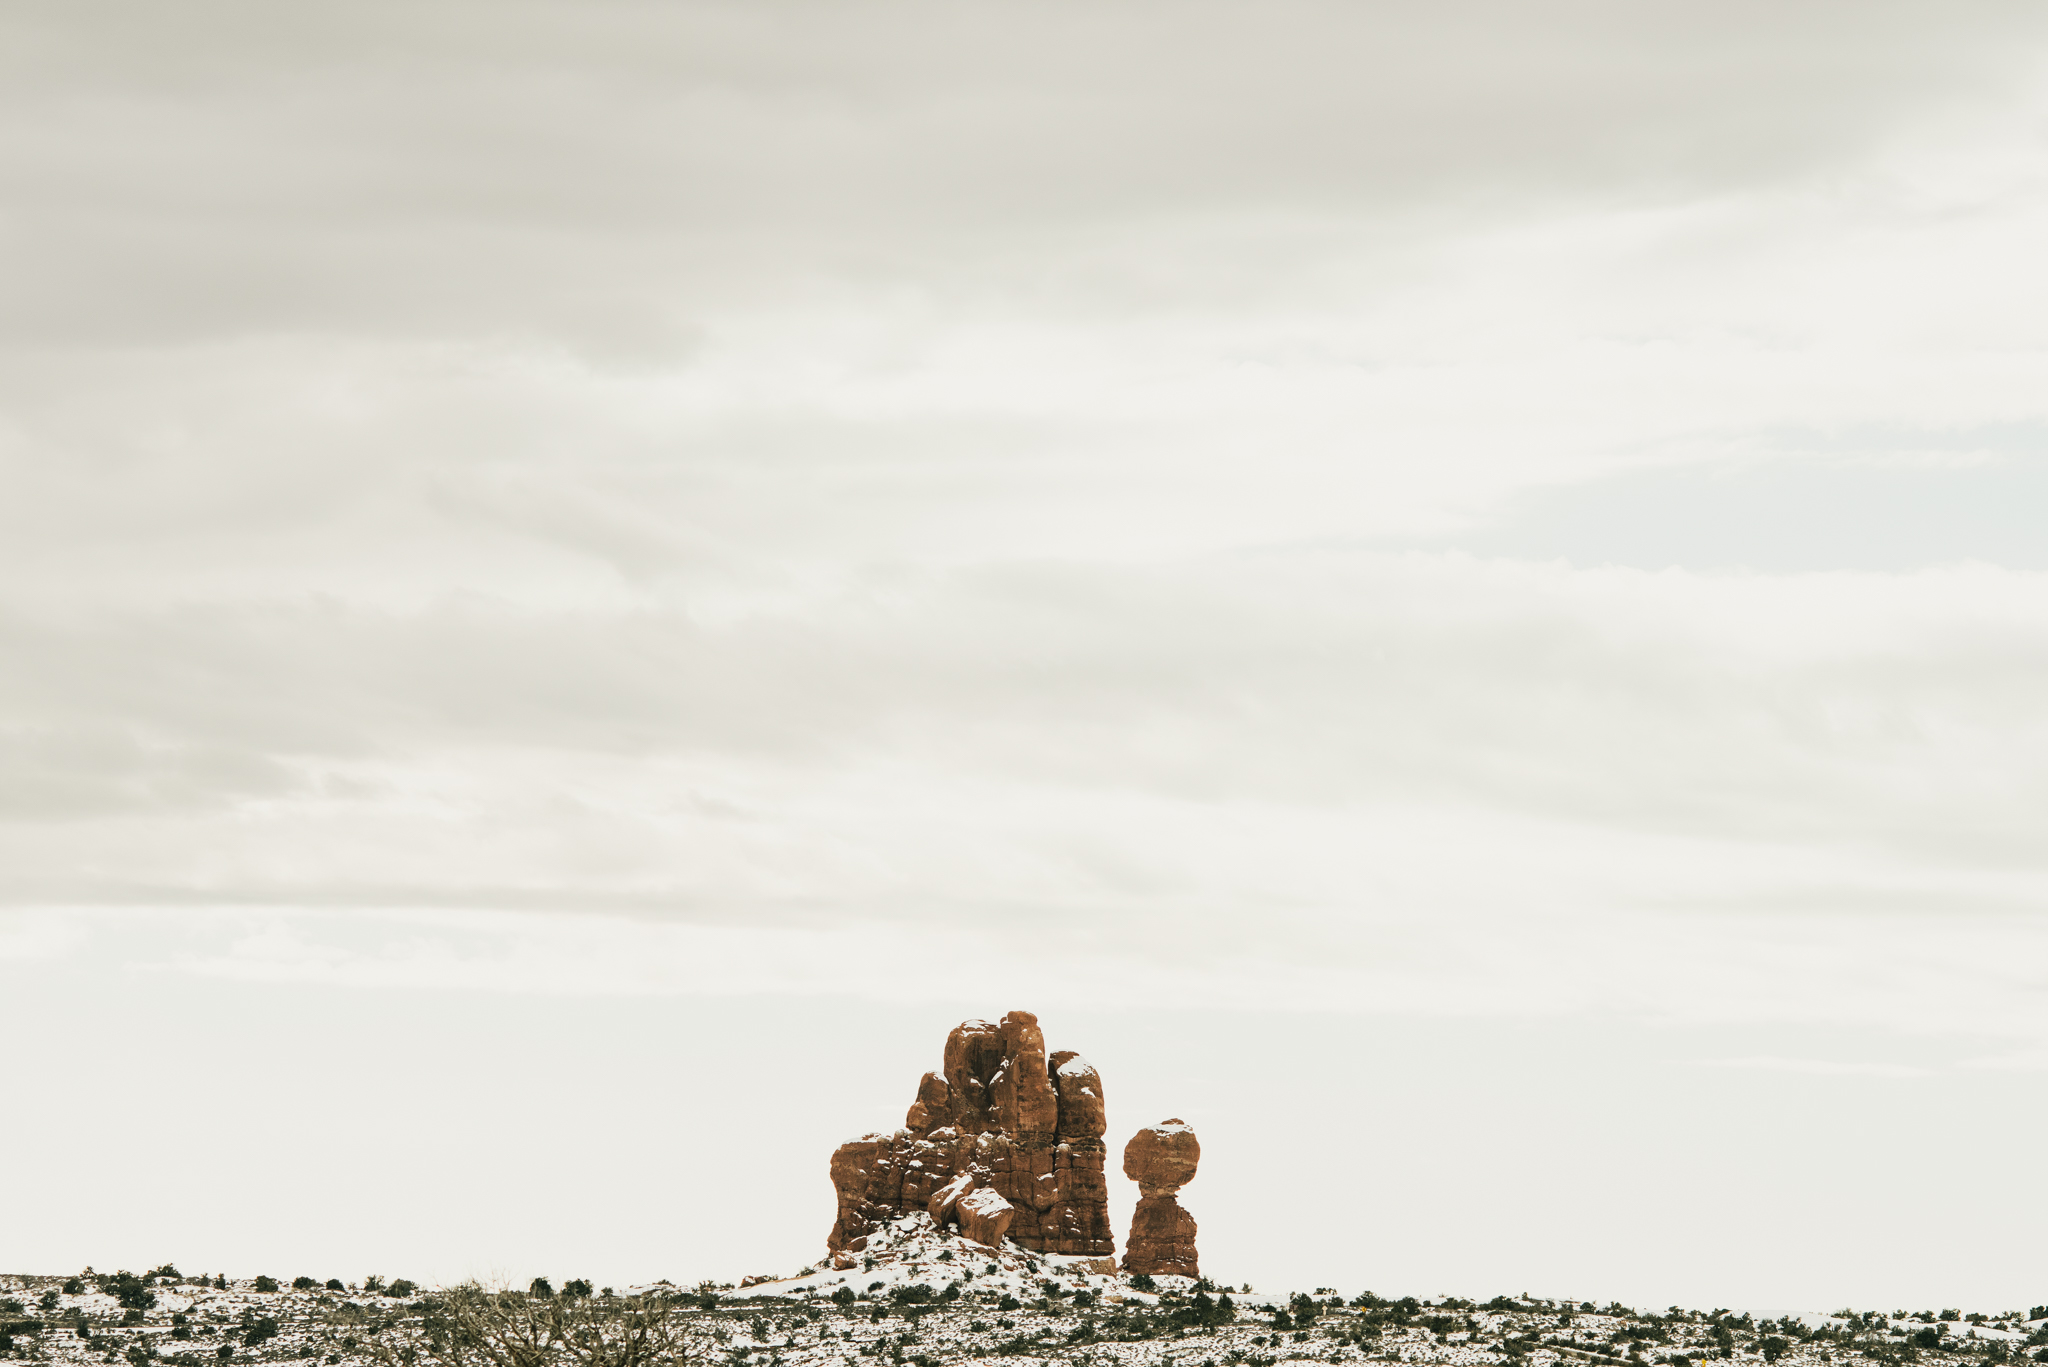 ©The-Ryans-Photography---Arches-National-Park-Moab-Utah-Travel-012.jpg